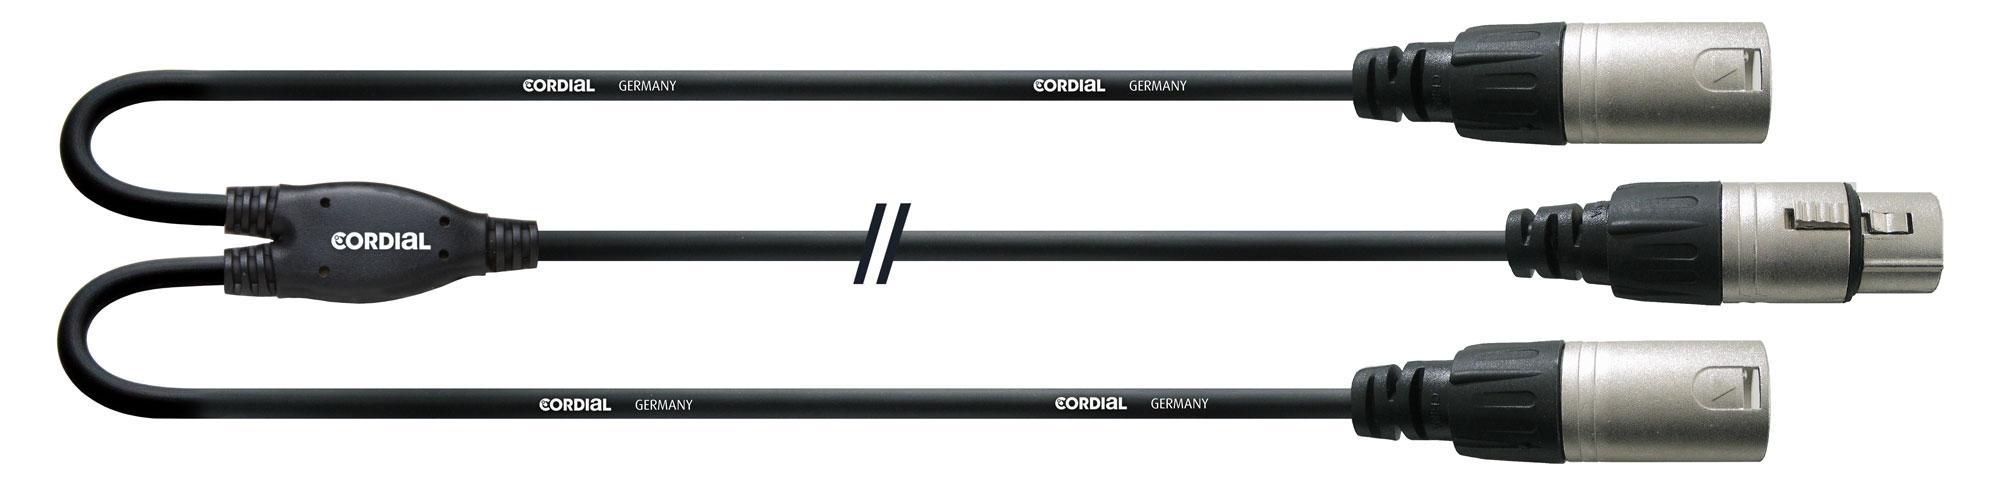 Kabelmulticores - Cordial CFY 0,3 FMM XLR Adapterkabel 0,3 m Schwarz - Onlineshop Musikhaus Kirstein